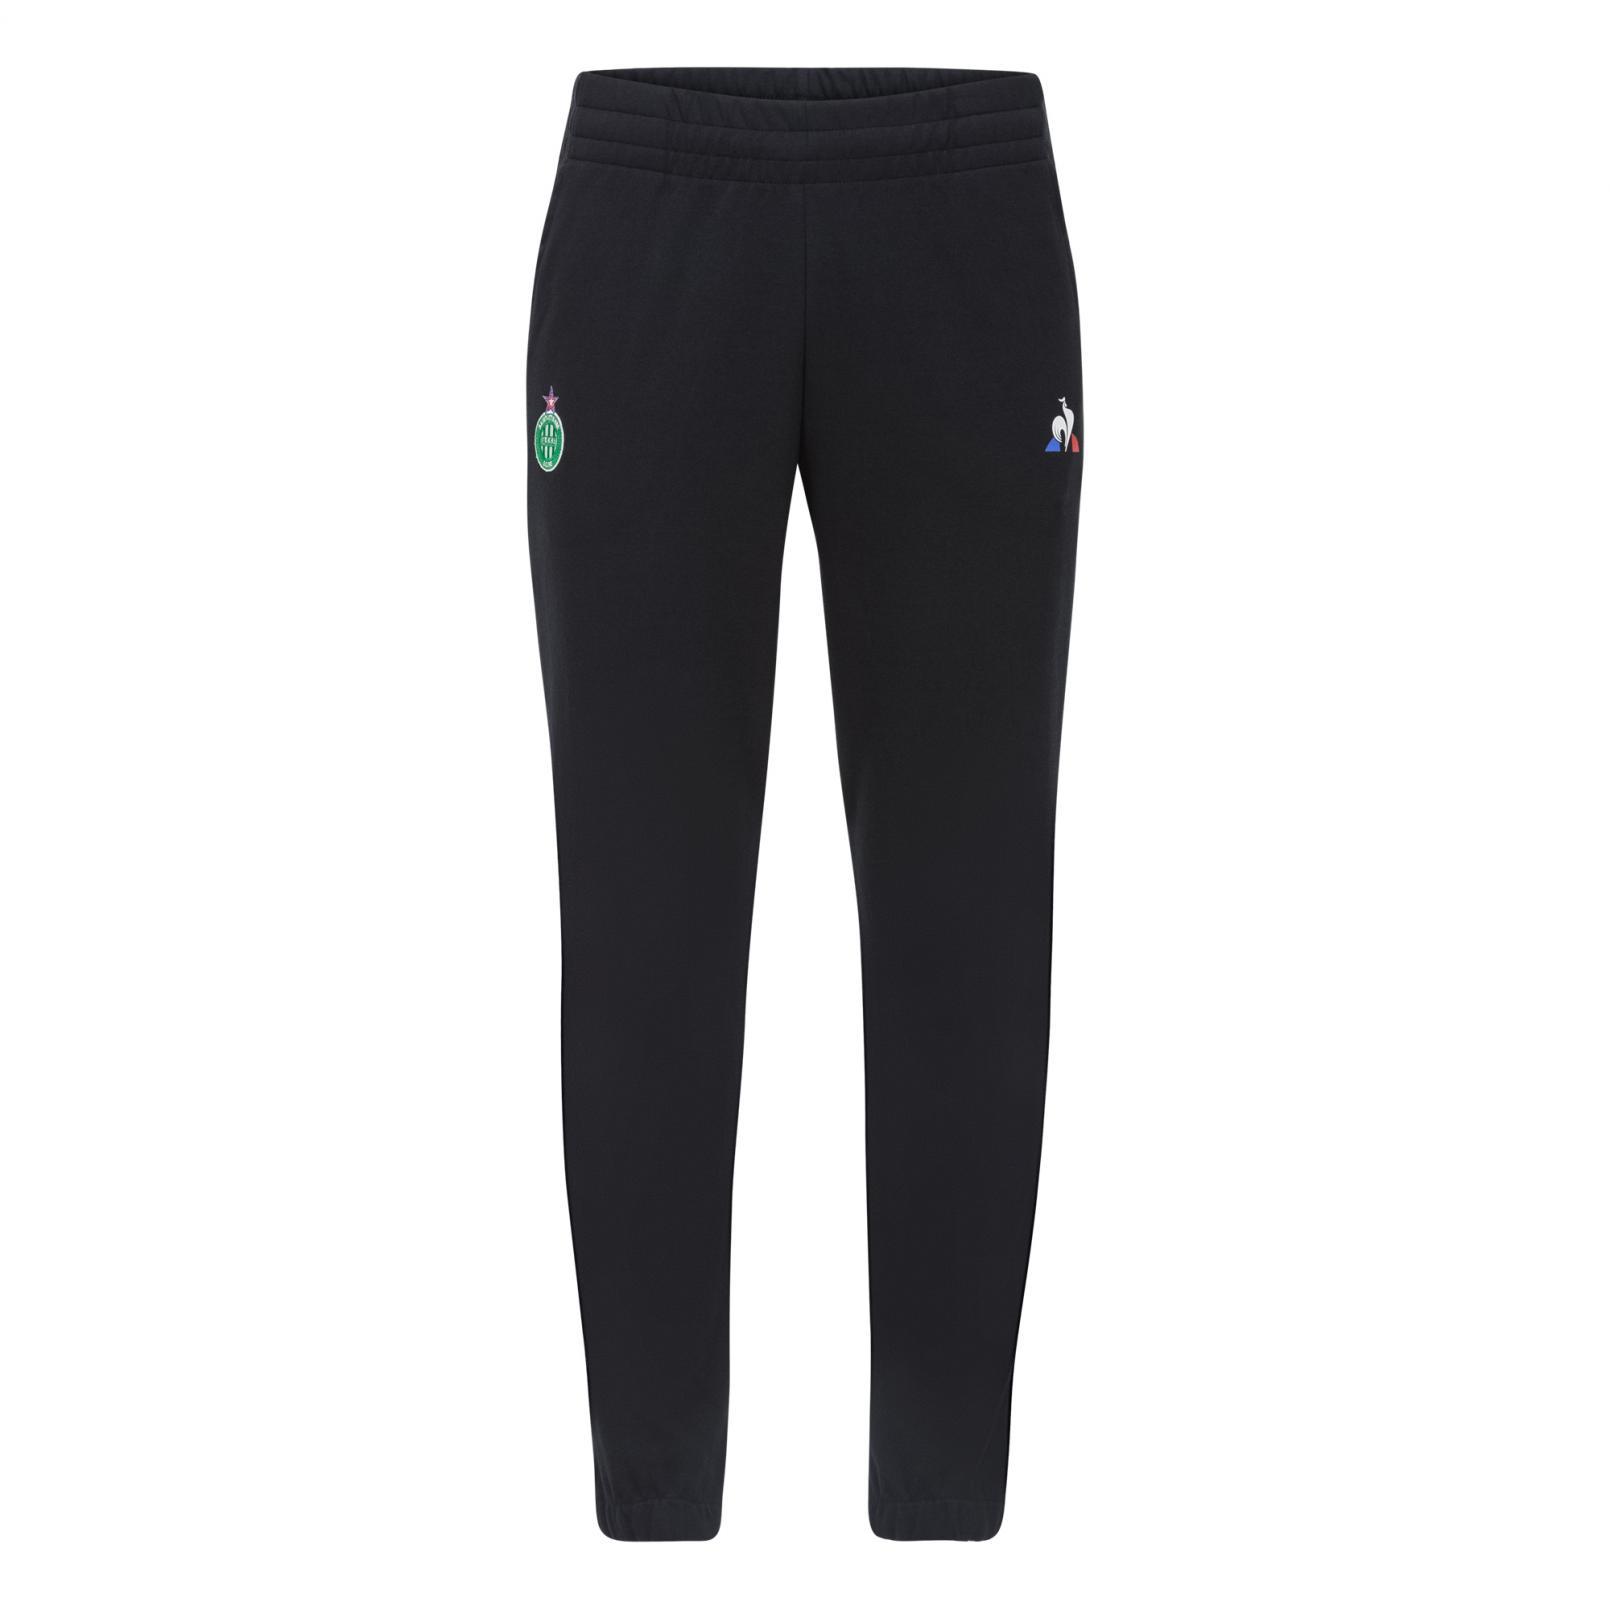 Pants – Le Coq Sportif ASSE Pres Pant Black